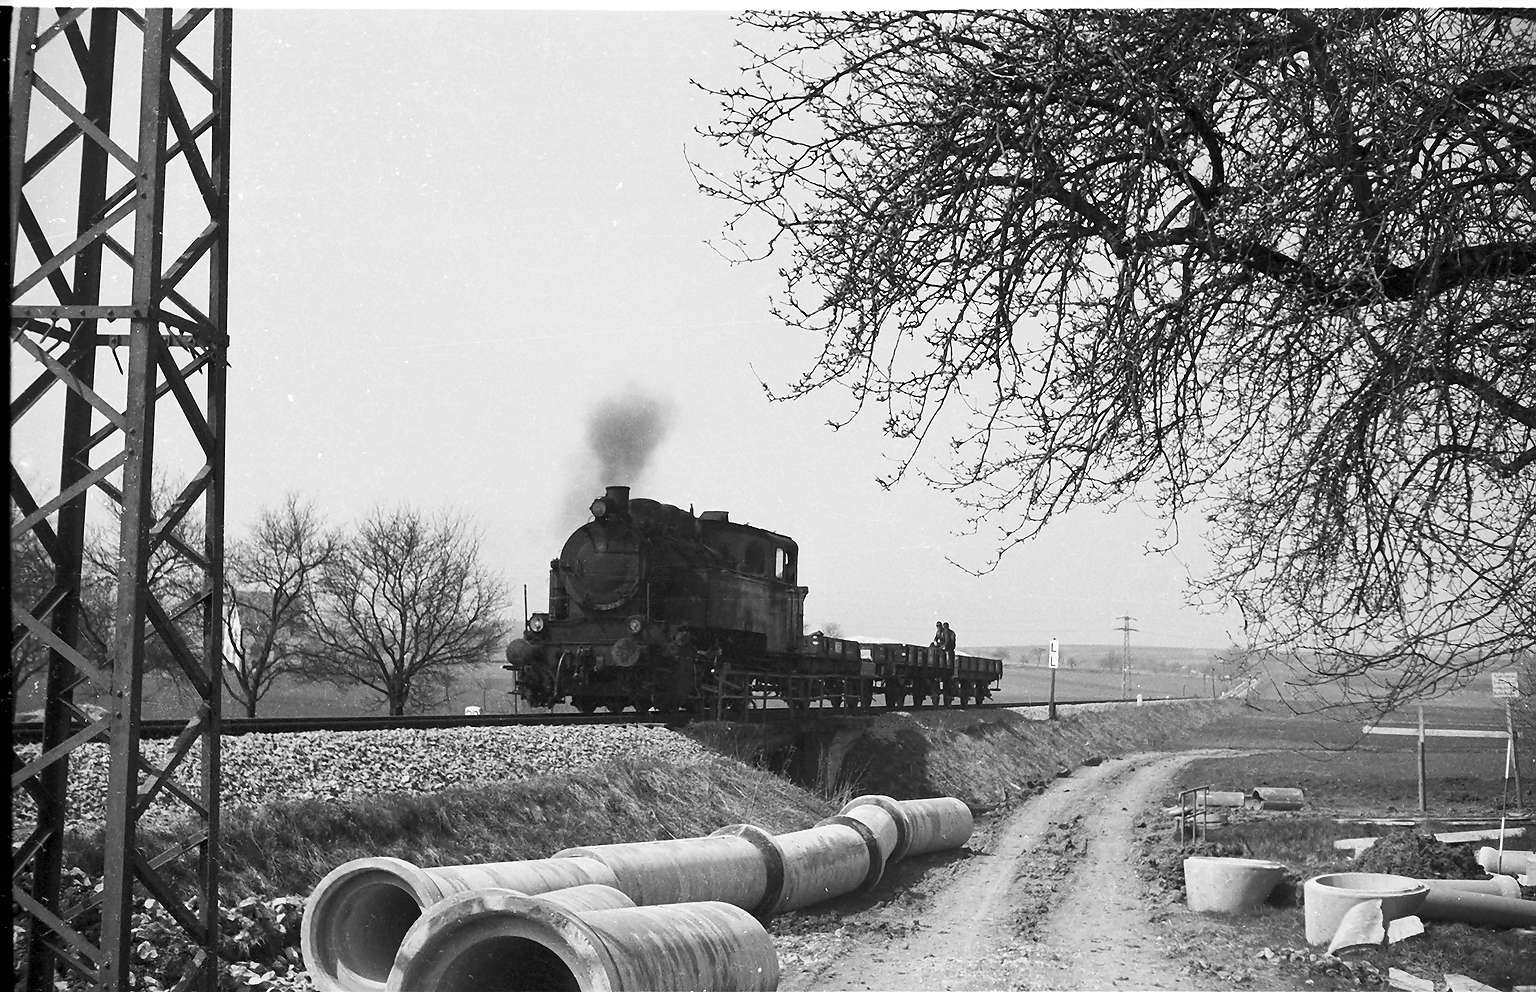 Lok 16, Baustelle Rangendingen, Arbeitszug 405, Bild 1